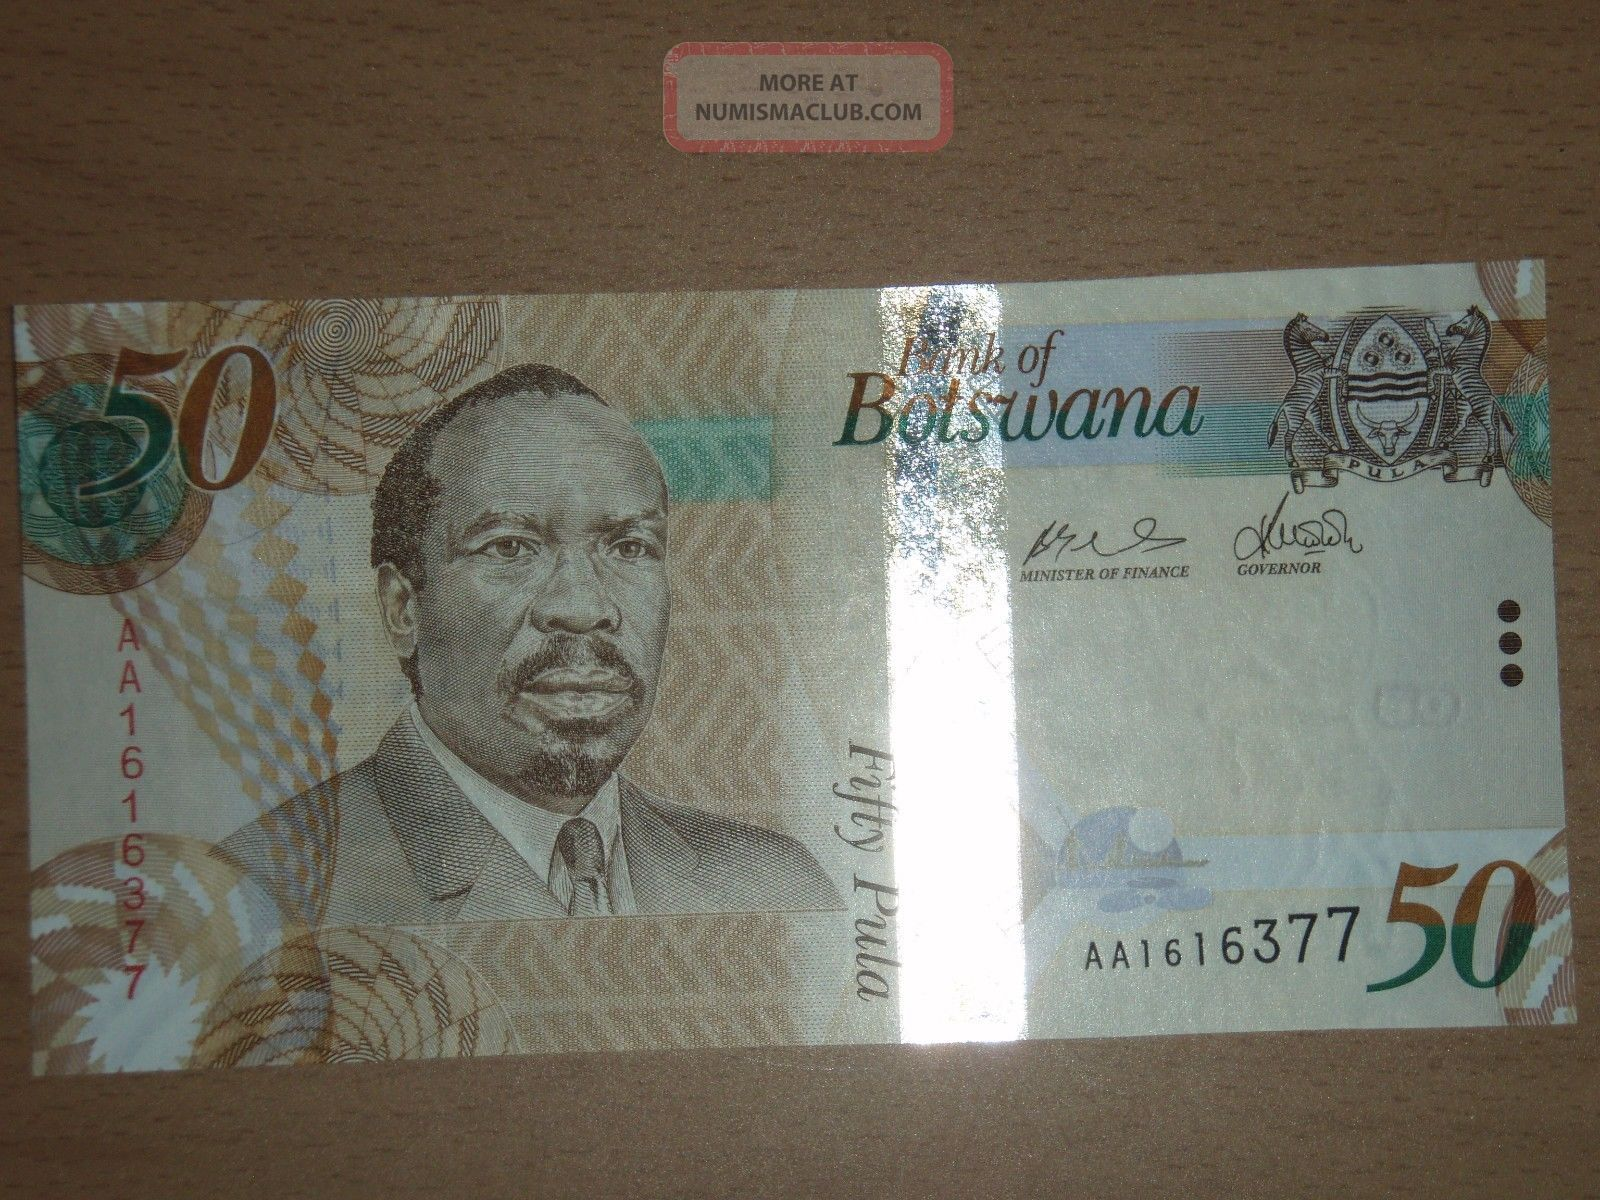 Botswana 50 Pula Unc Africa photo